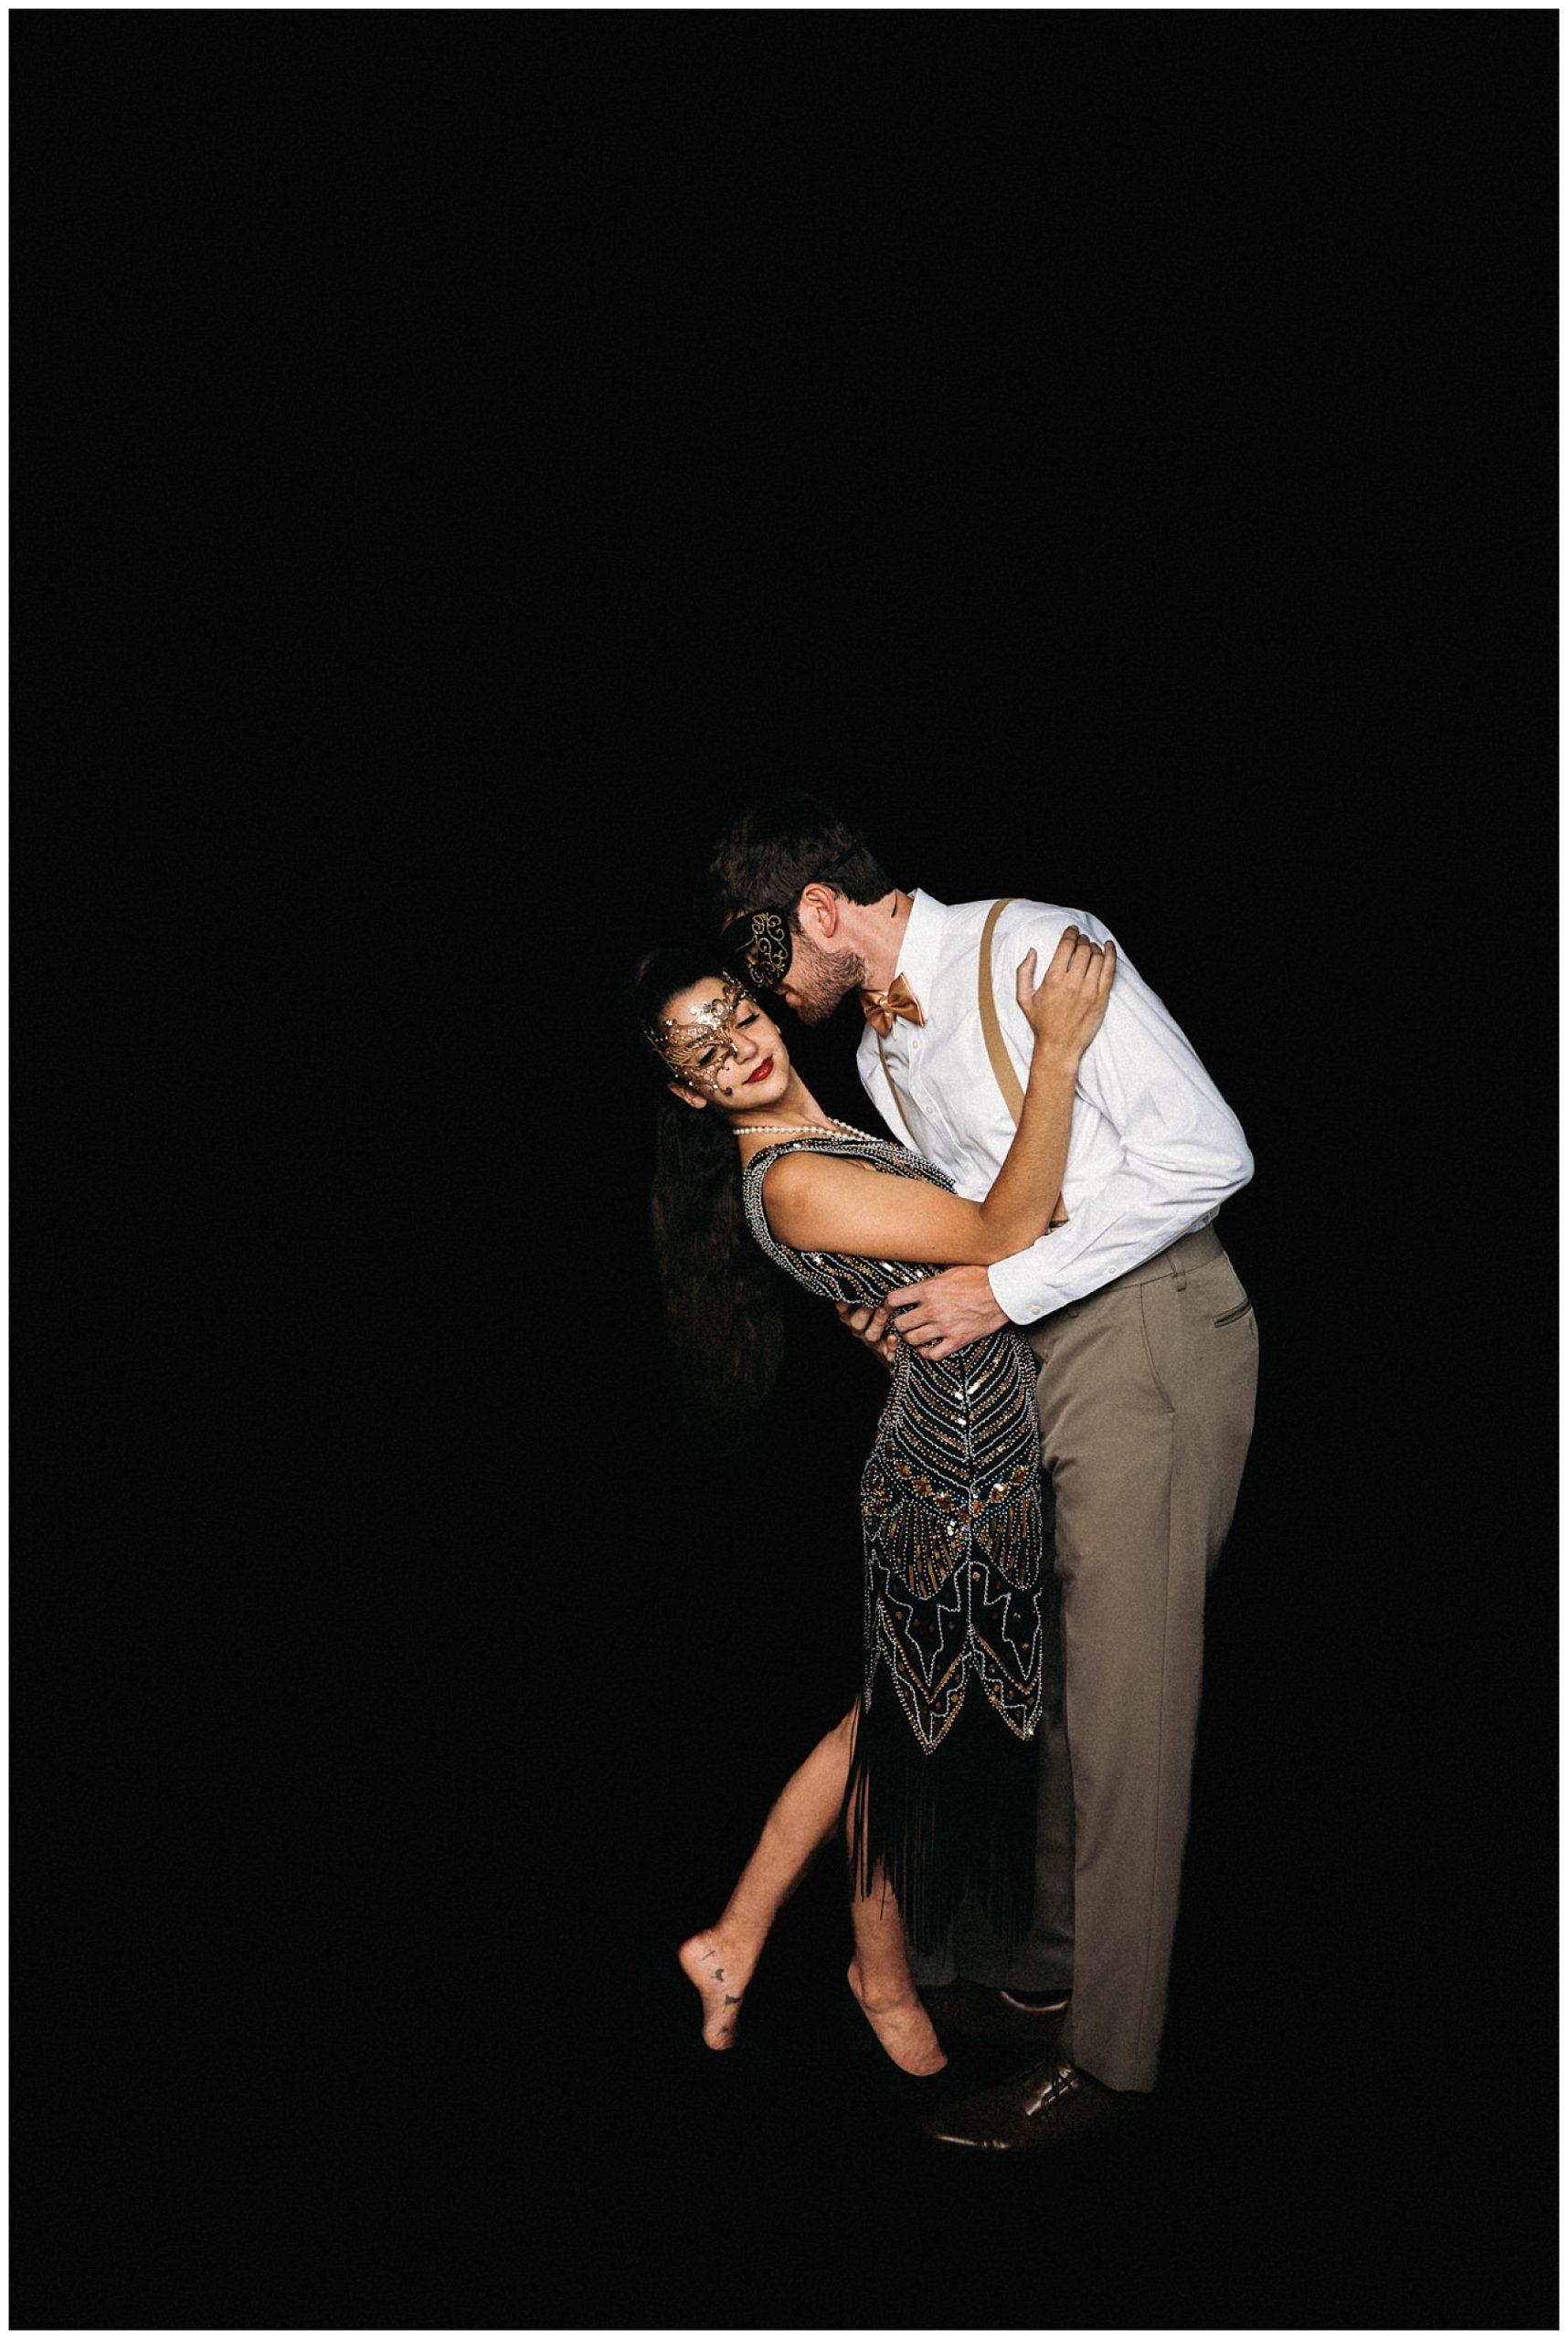 gatsby-styled-couples-shoot-final-g-web-20190707-0040_CCS-1.jpg